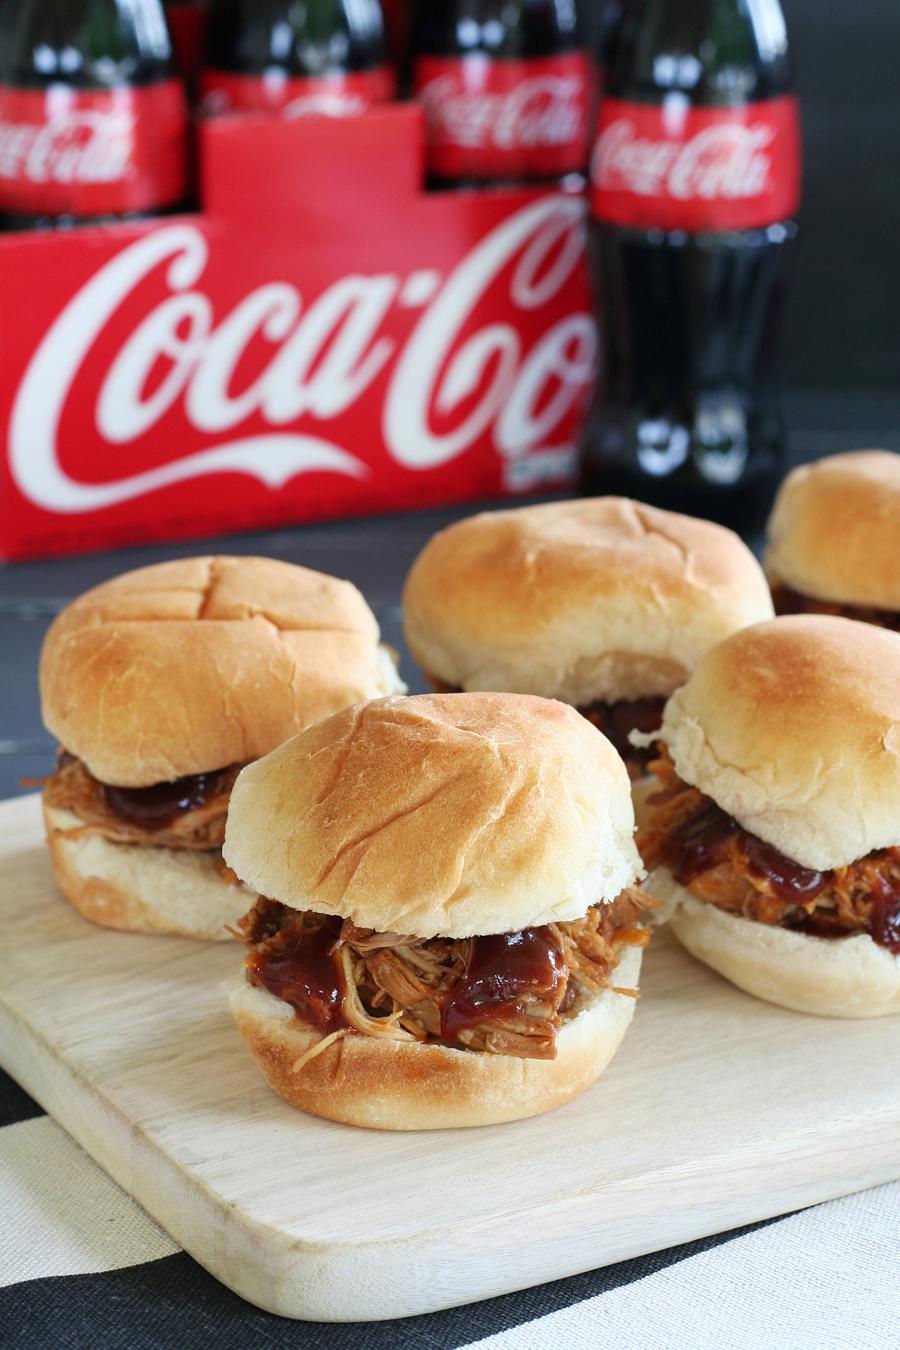 Crockpot Coca-Cola BBQ Chicken Sliders